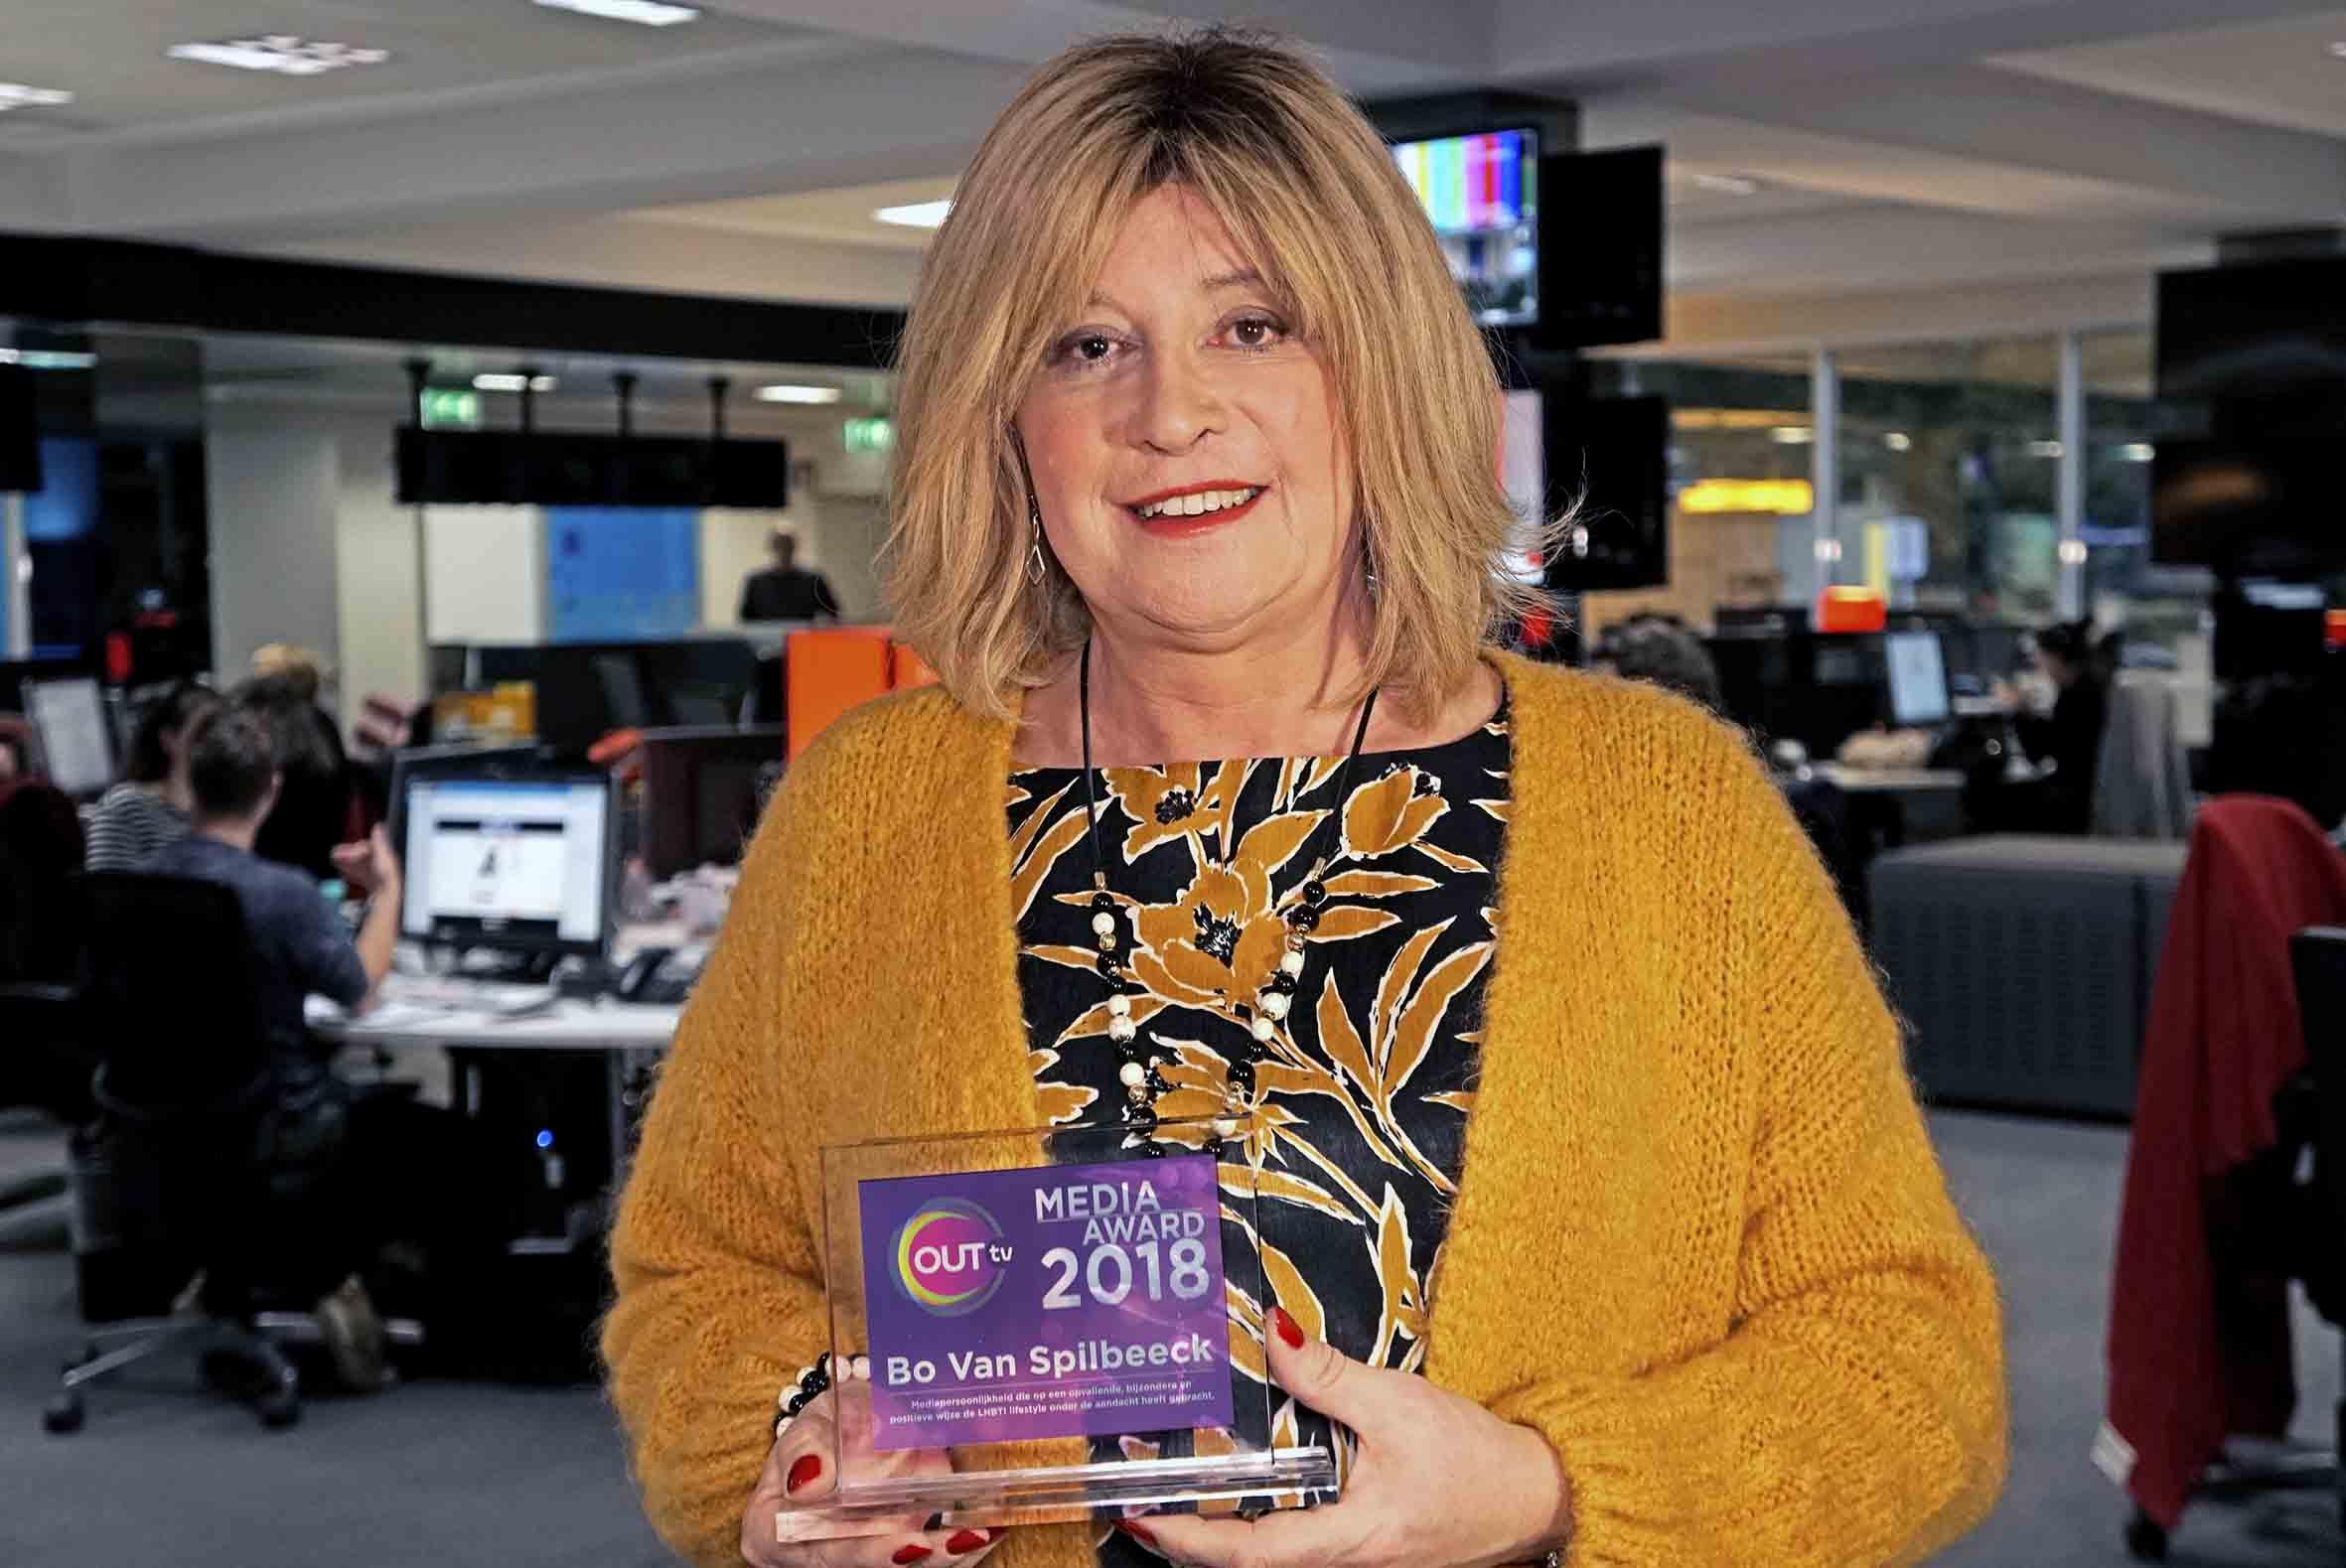 Bo Van Spilbeeck Wint Outtv Media Award 2018